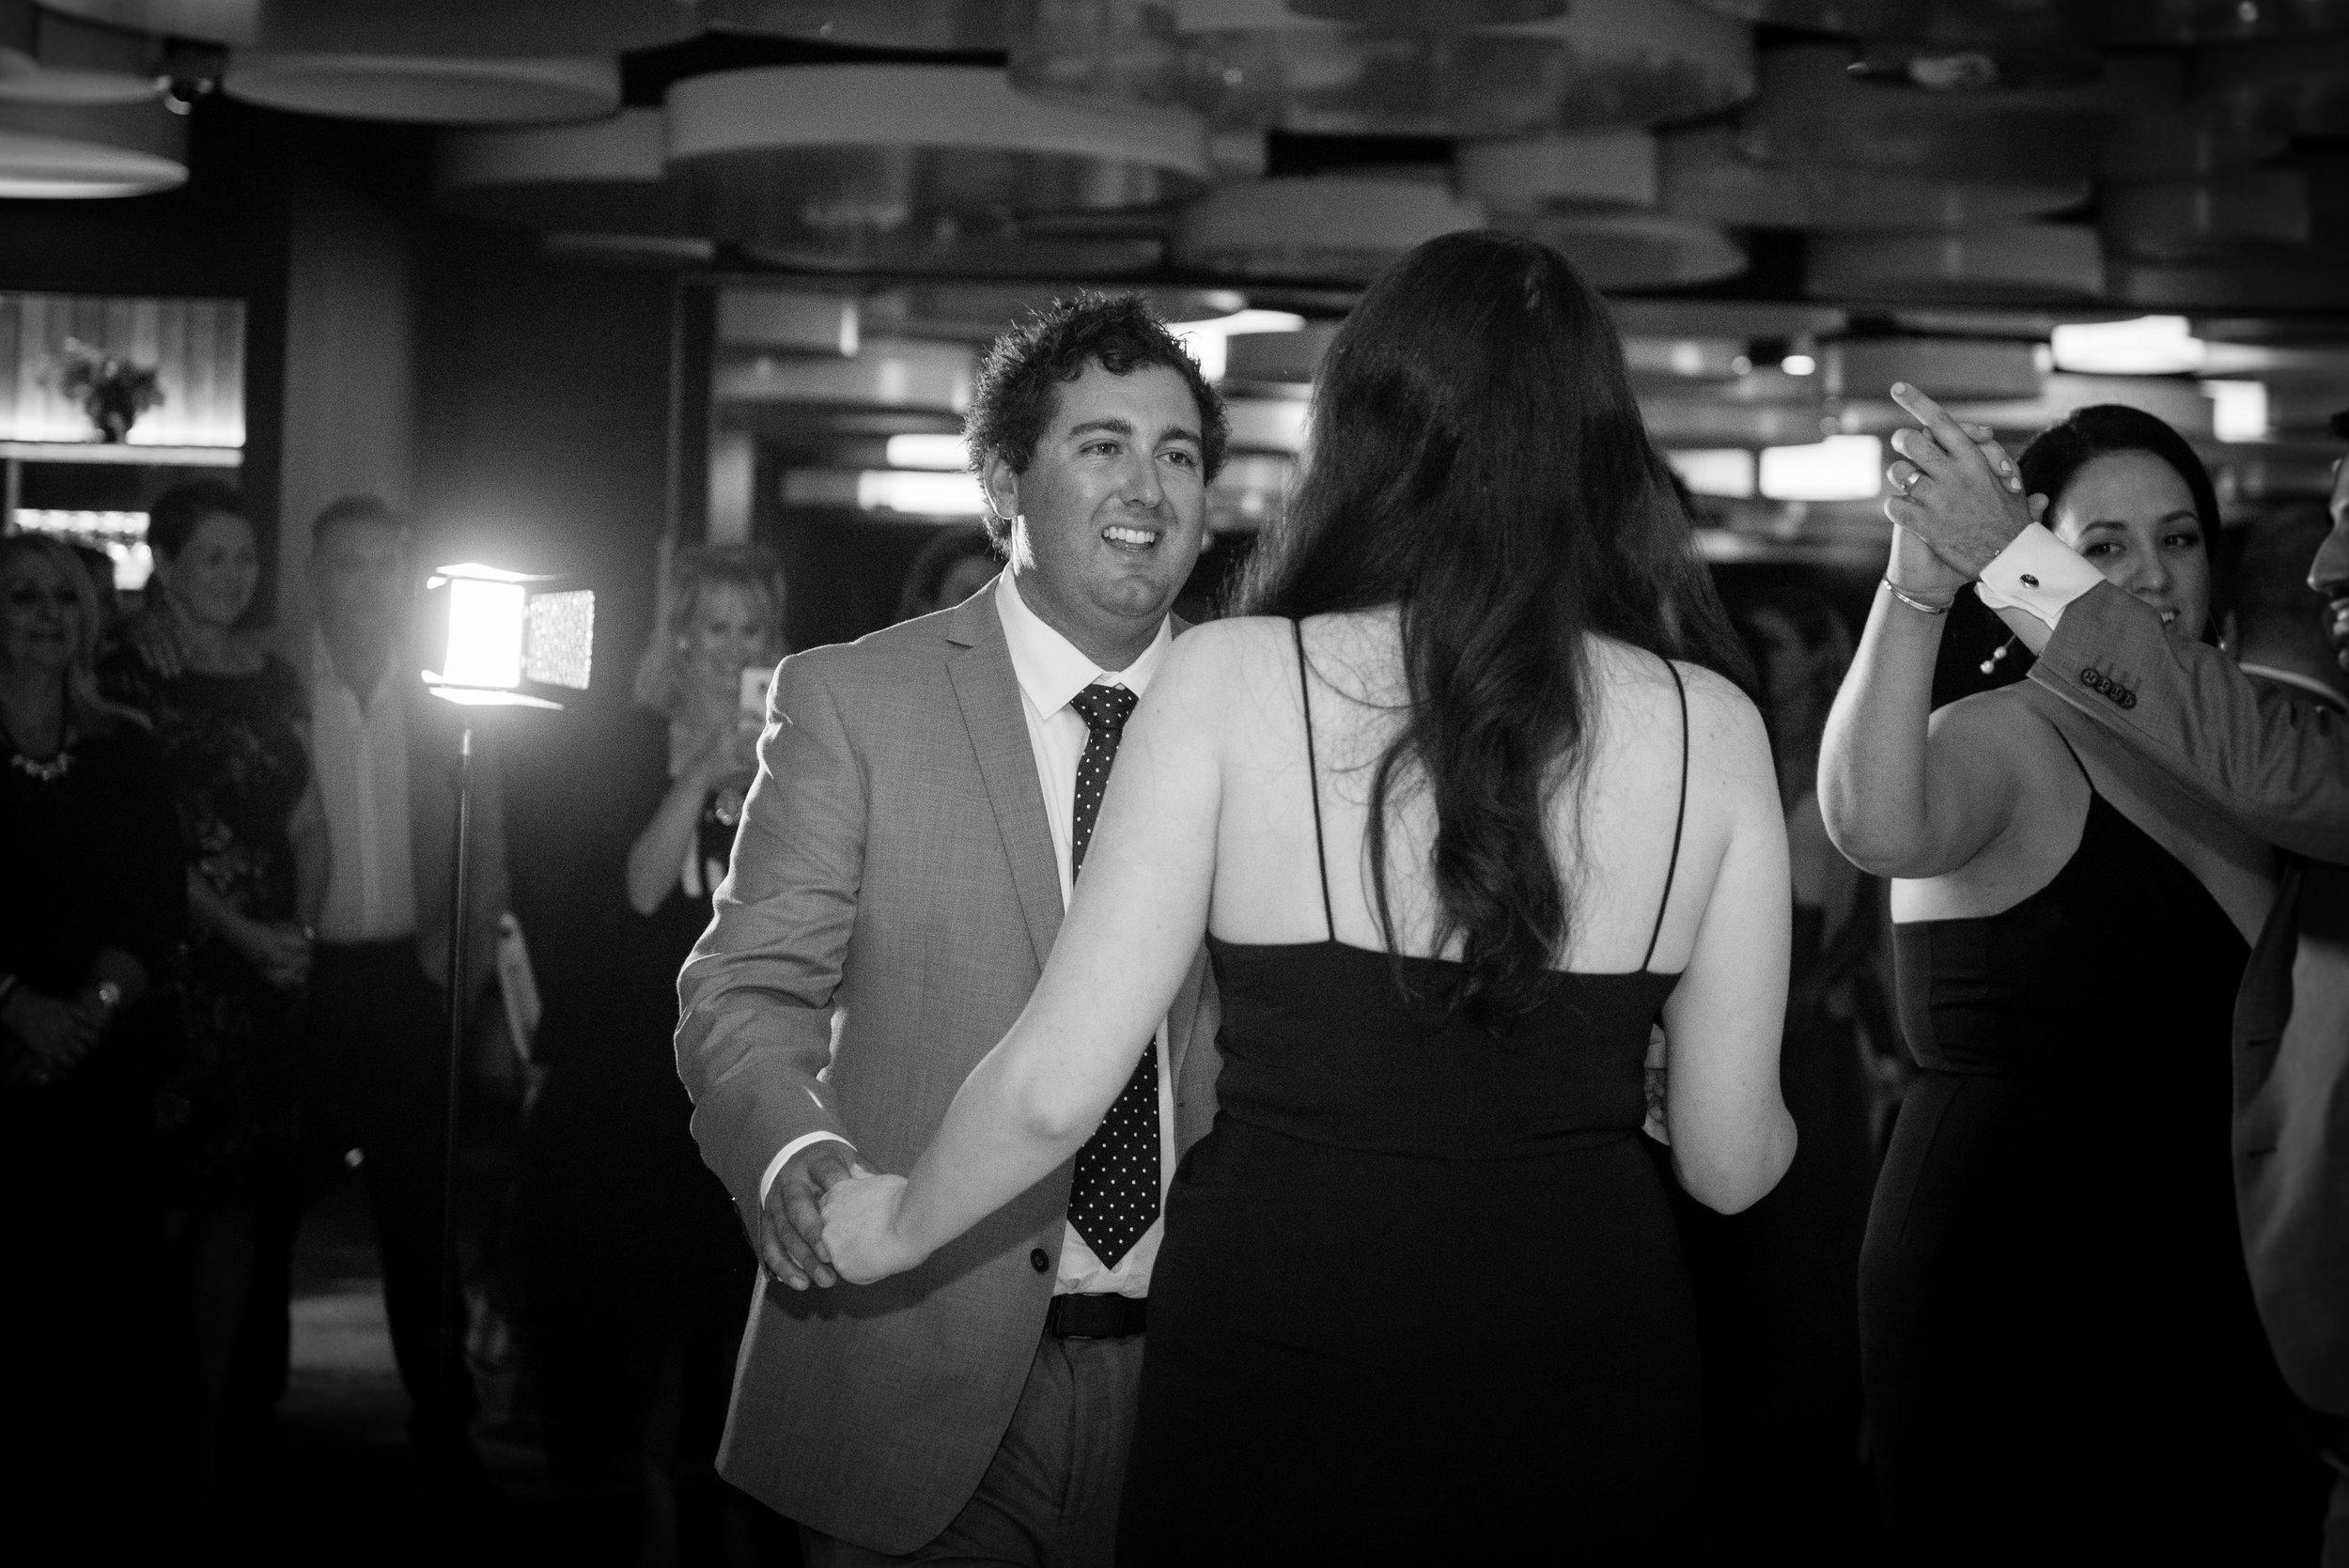 brisbane-city-wedding-photographer-romantic-wedding-115.jpg